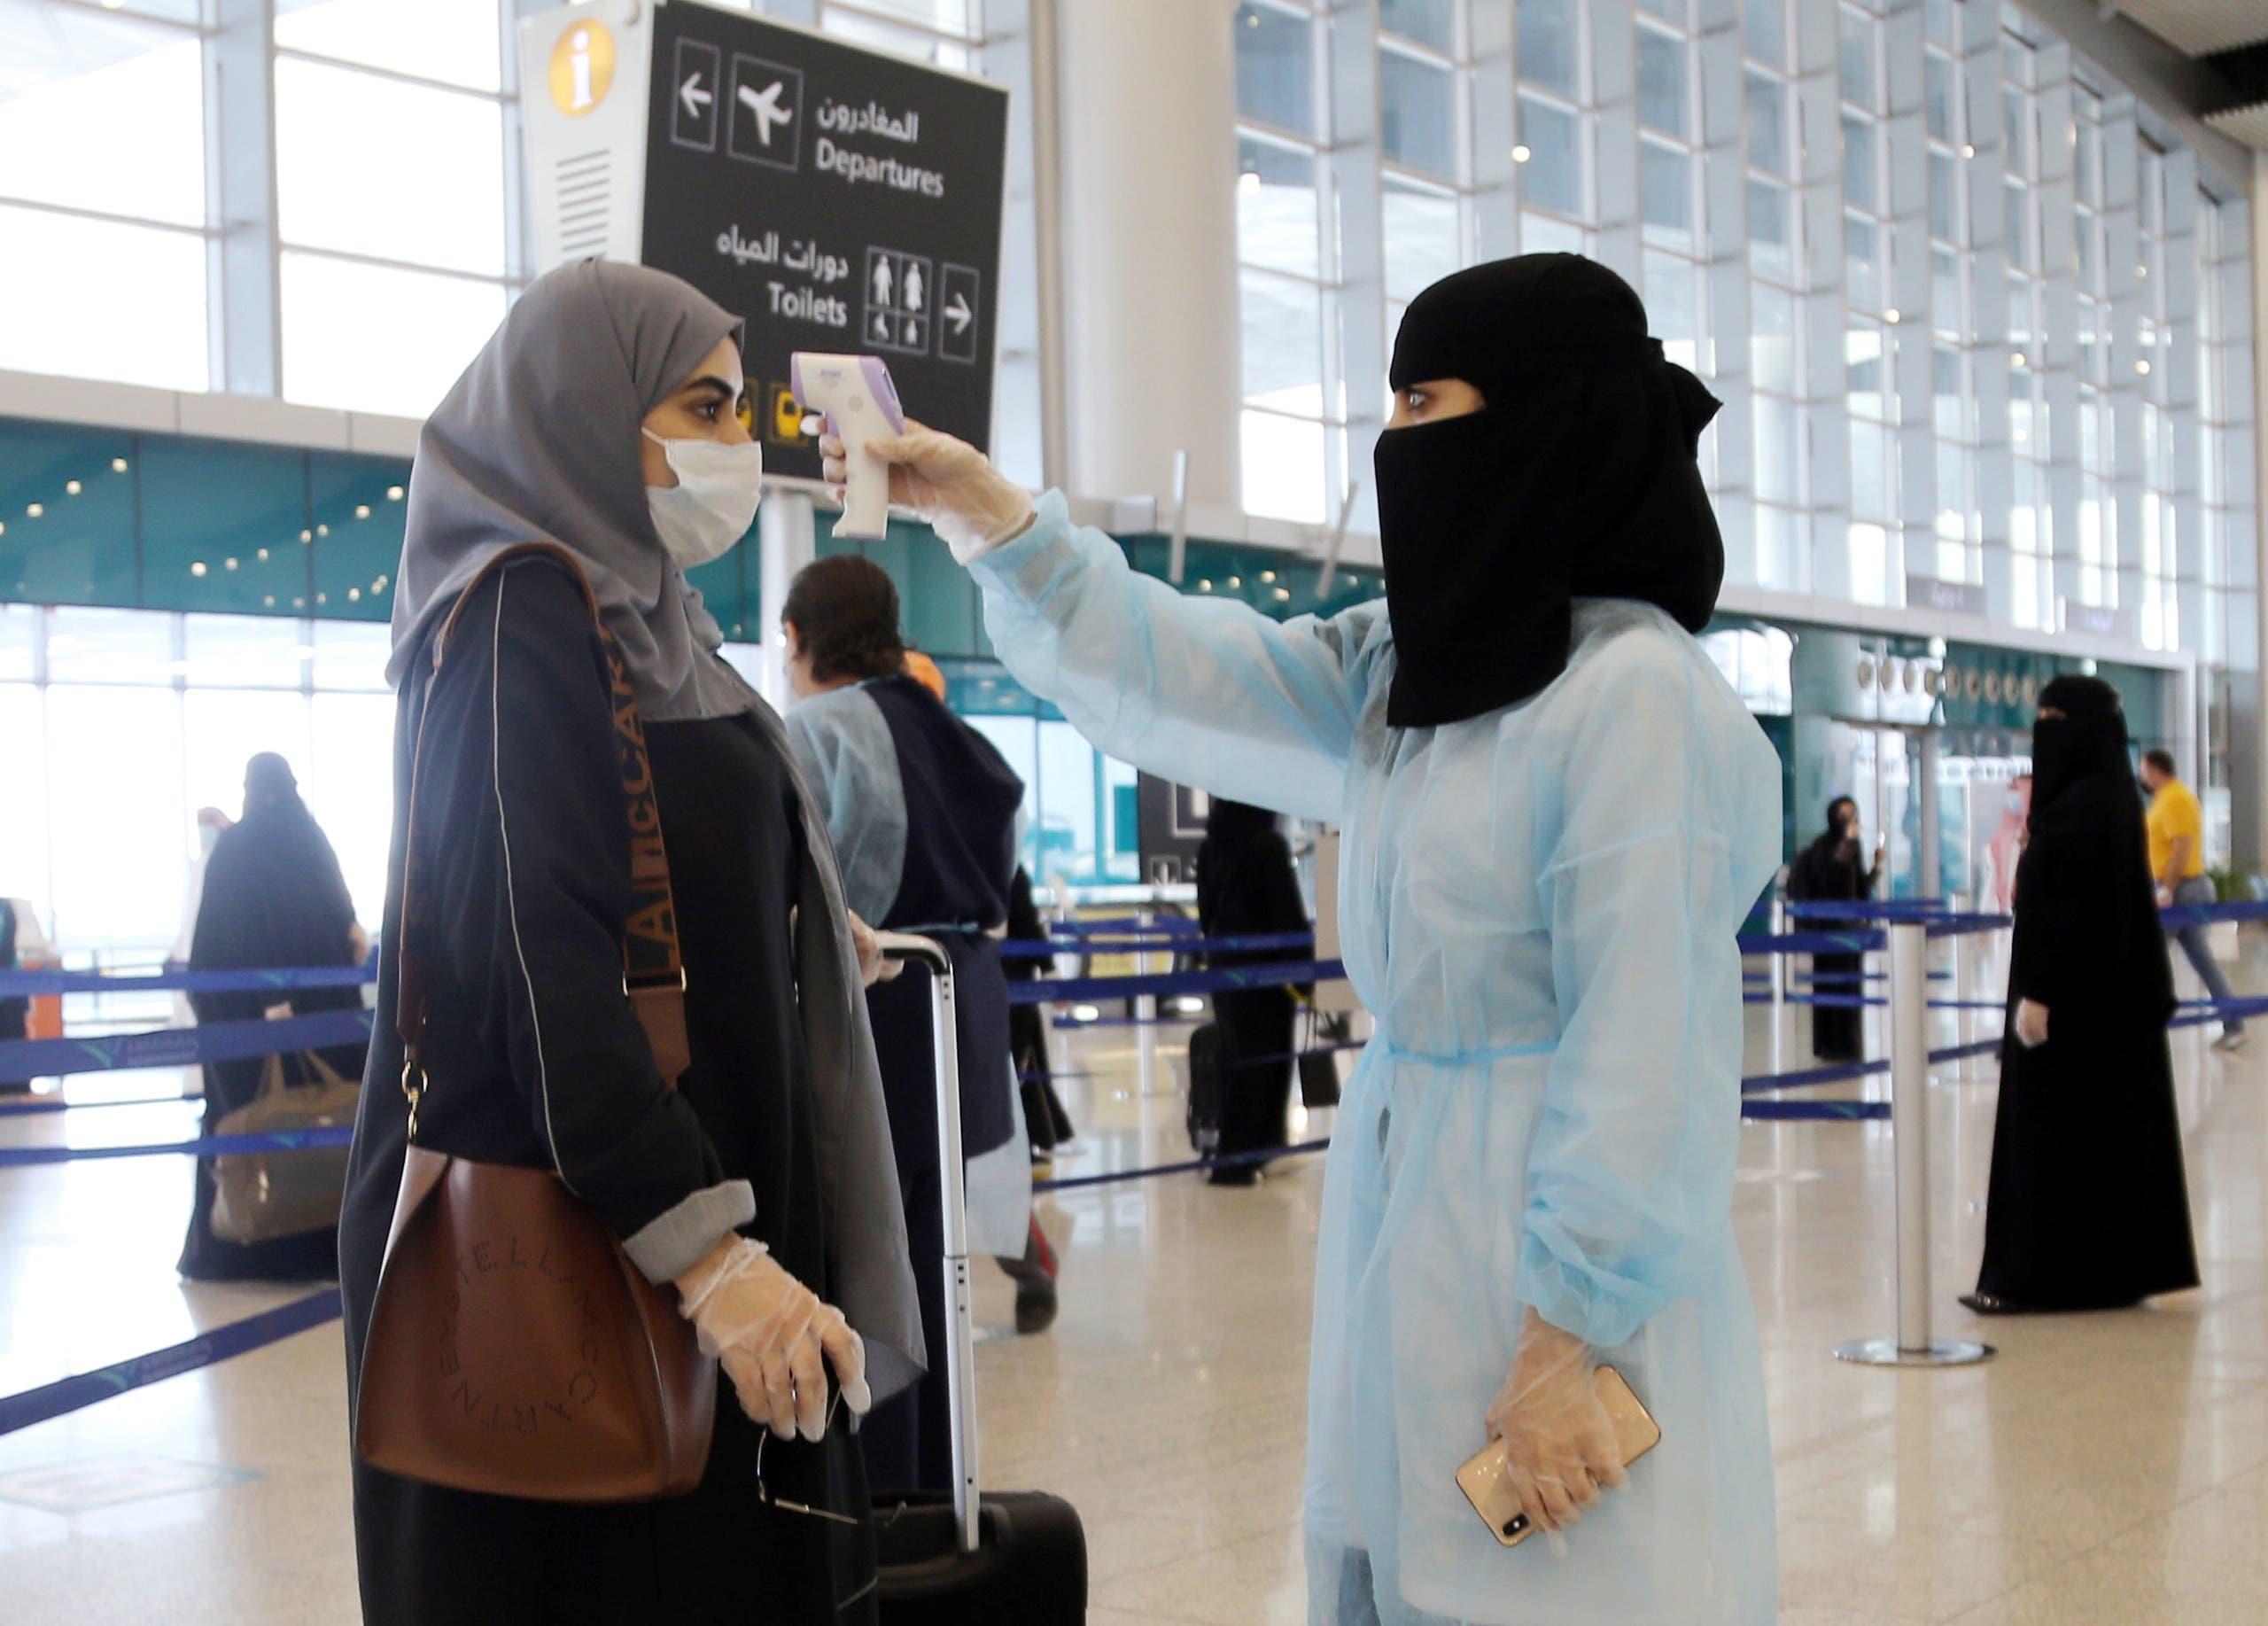 A security woman checks the temperature of a woman at Riyadh International Airport, after Saudi Arabia reopened domestic flights, following the outbreak of the coronavirus disease (COVID-19), in Riyadh, Saudi Arabia May 31, 2020. (File photo: Reuters)